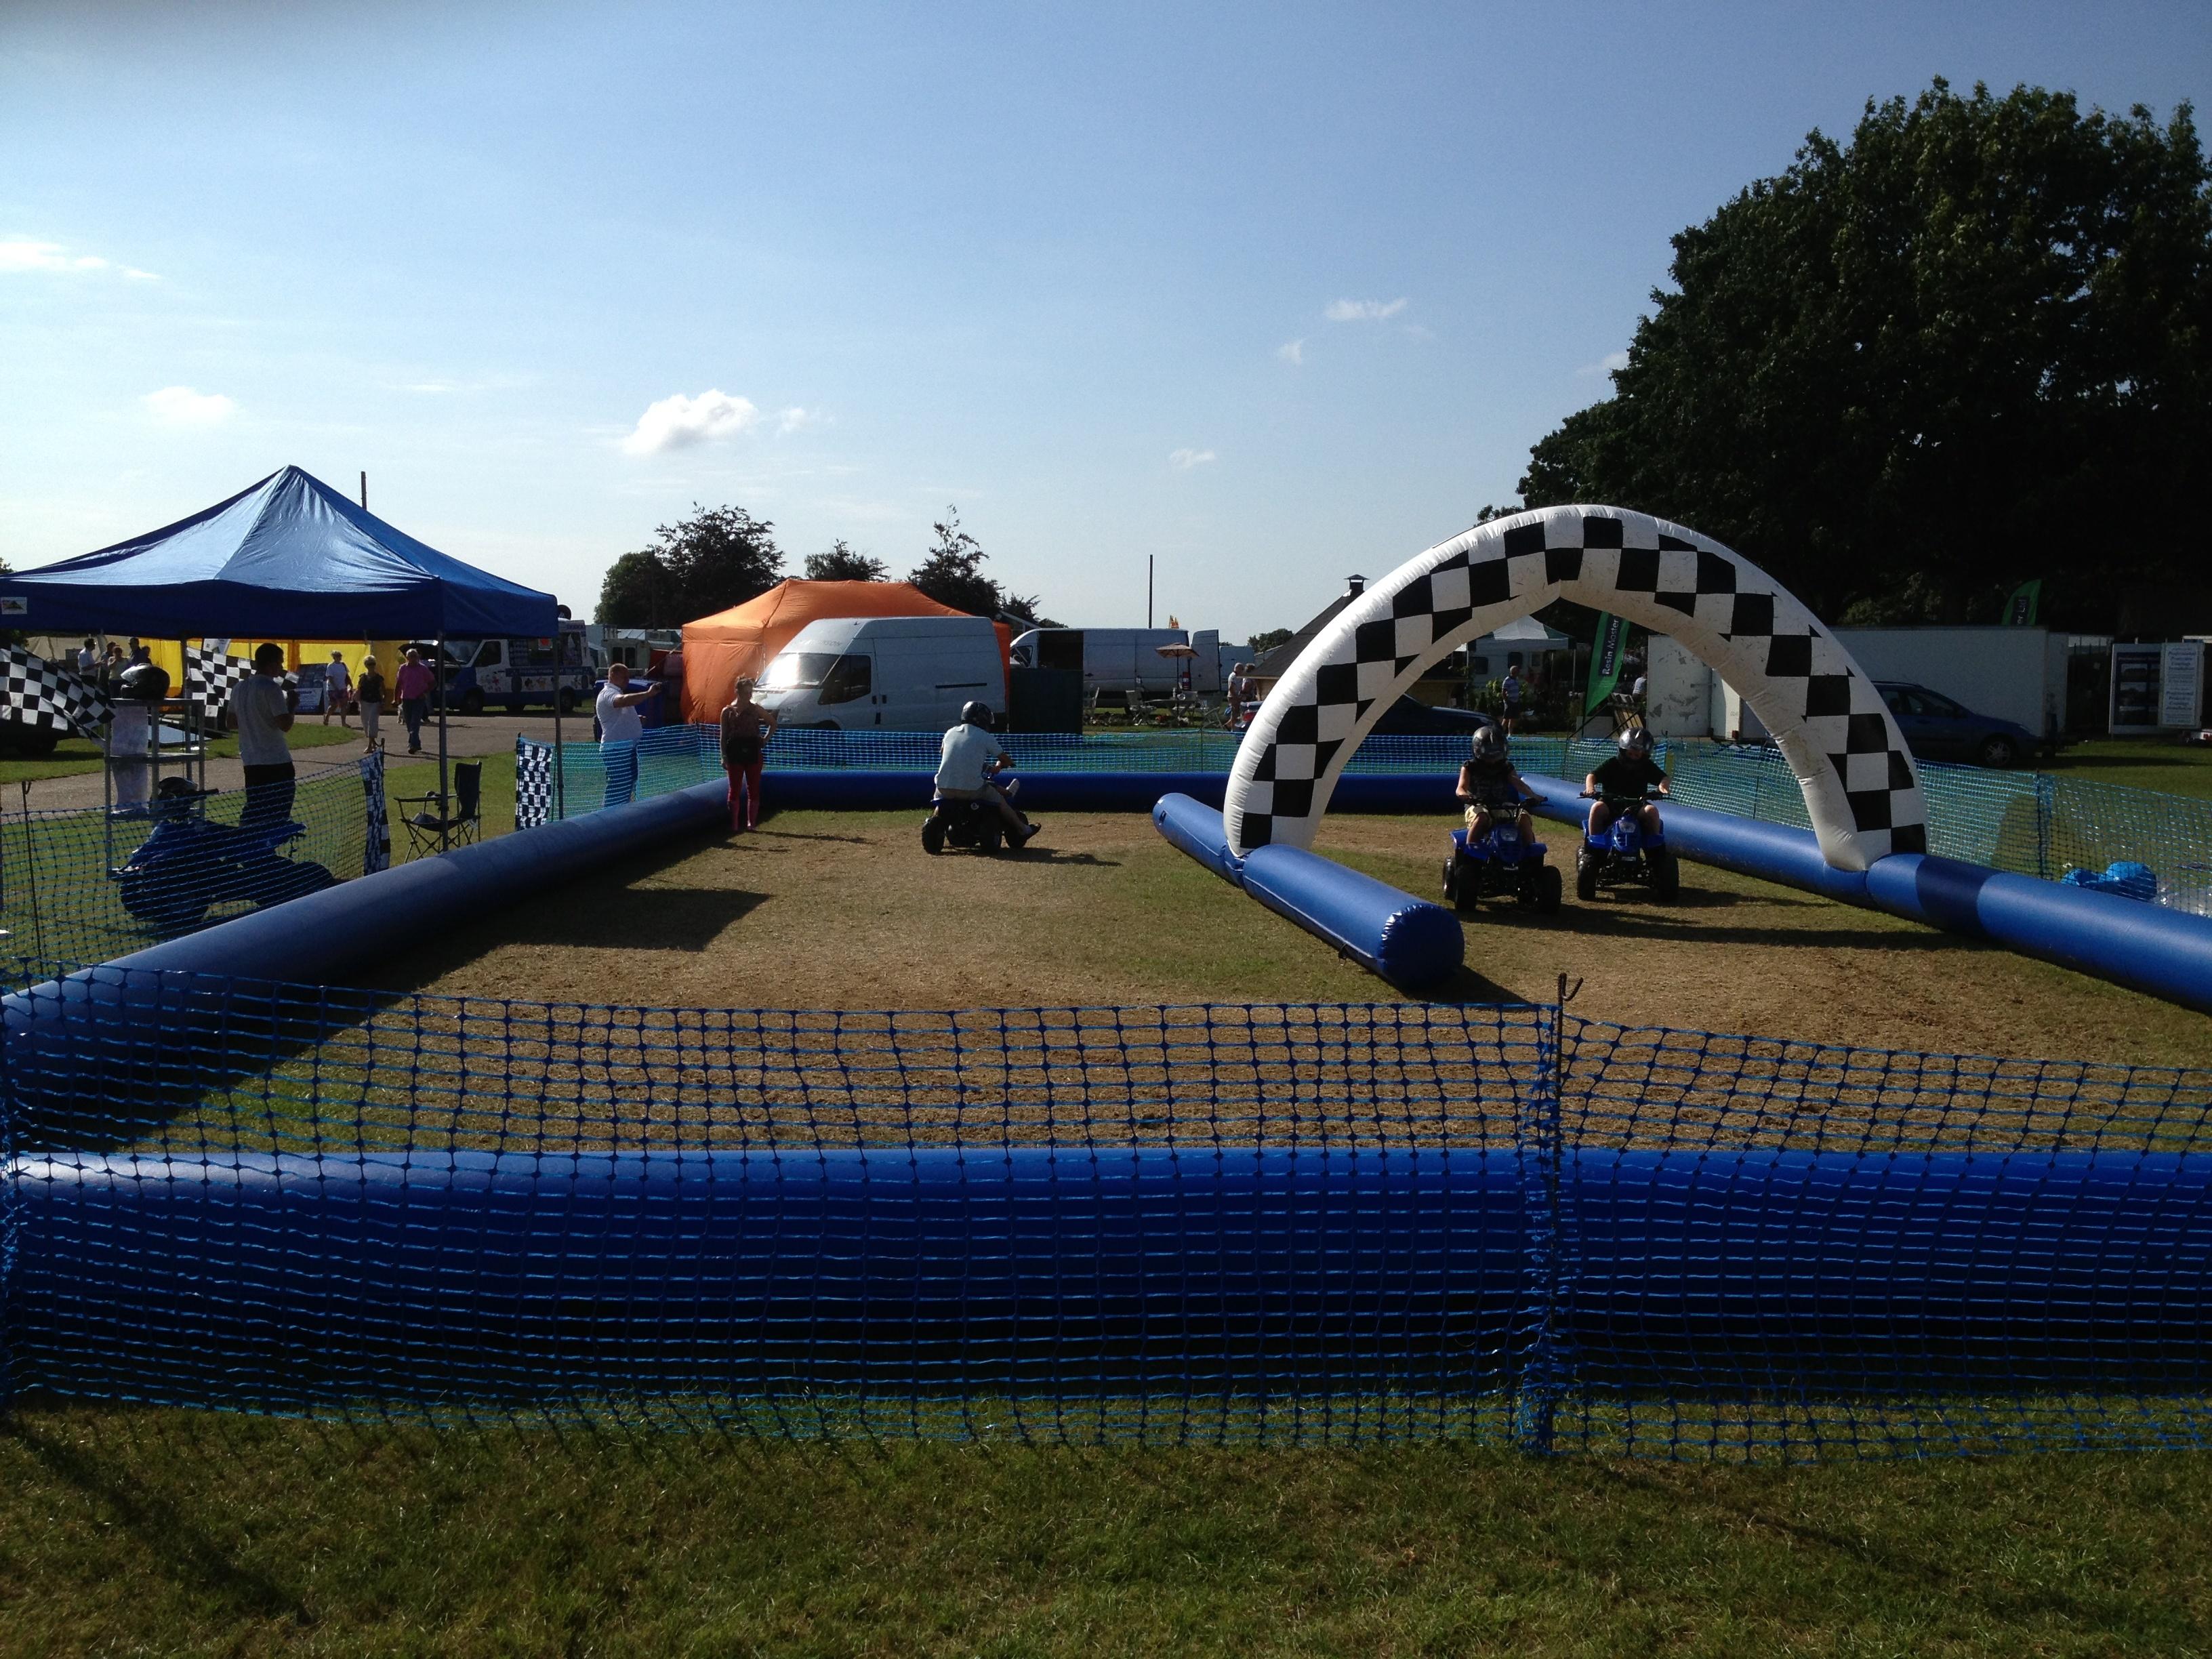 Inflatable Quad Biking Course